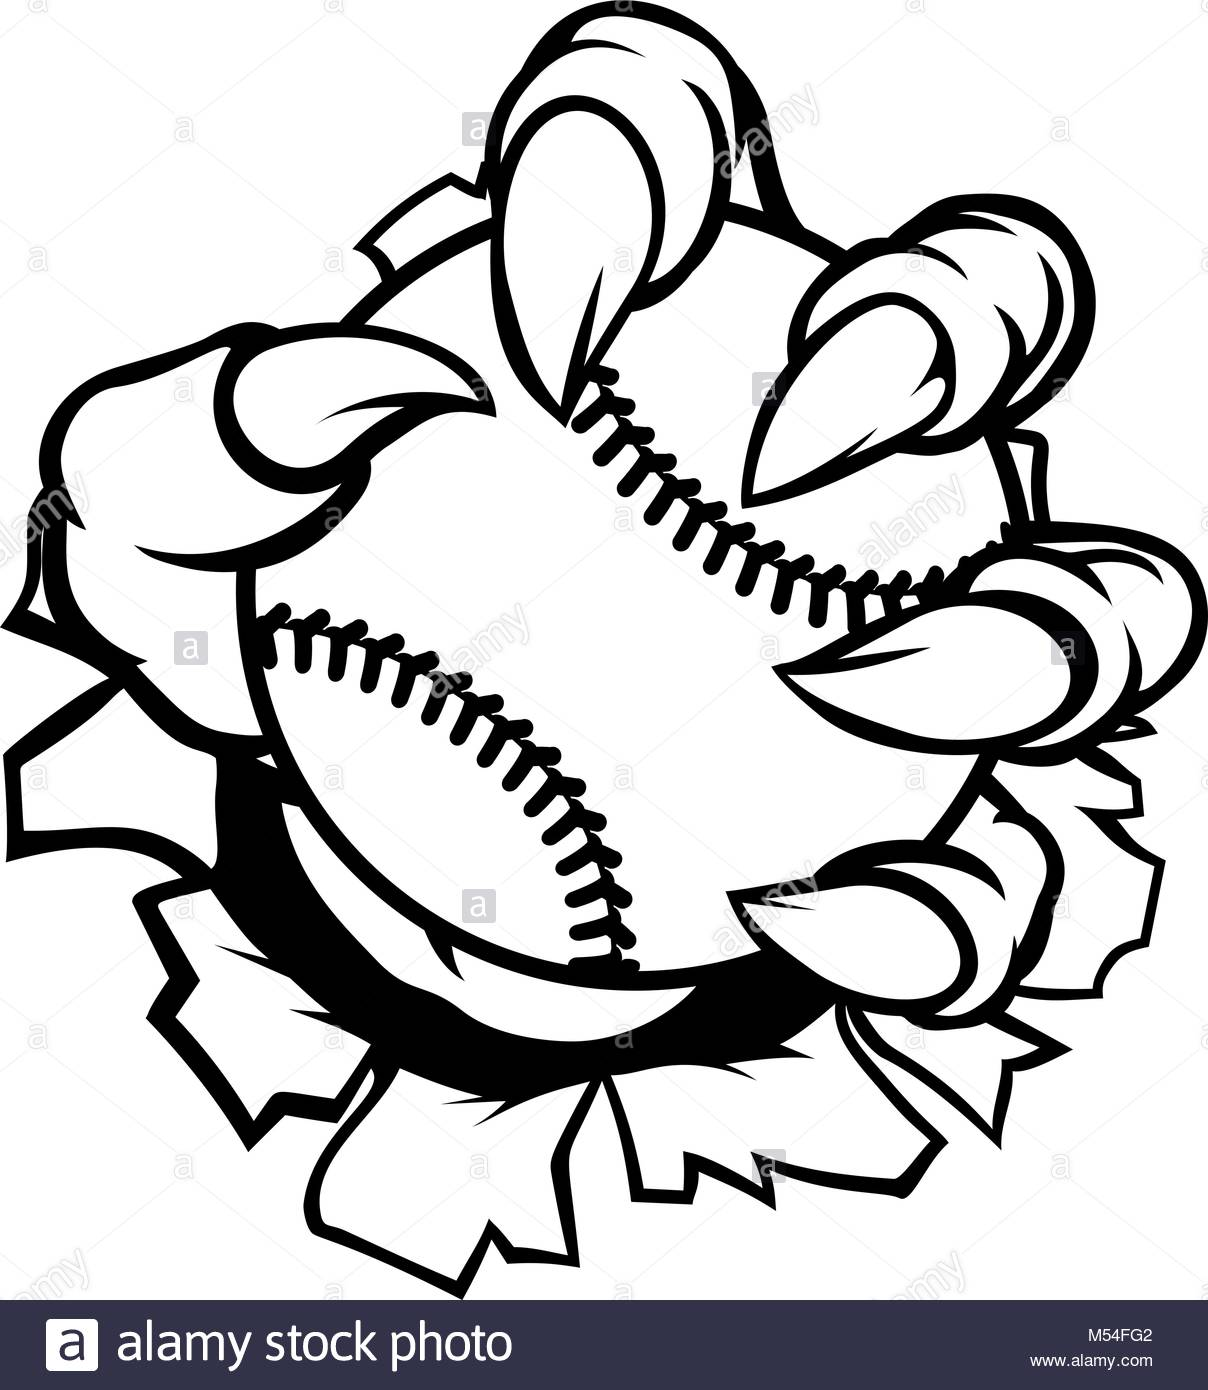 1208x1390 Monster Or Animal Claw Holding Baseball Ball Stock Vector Art